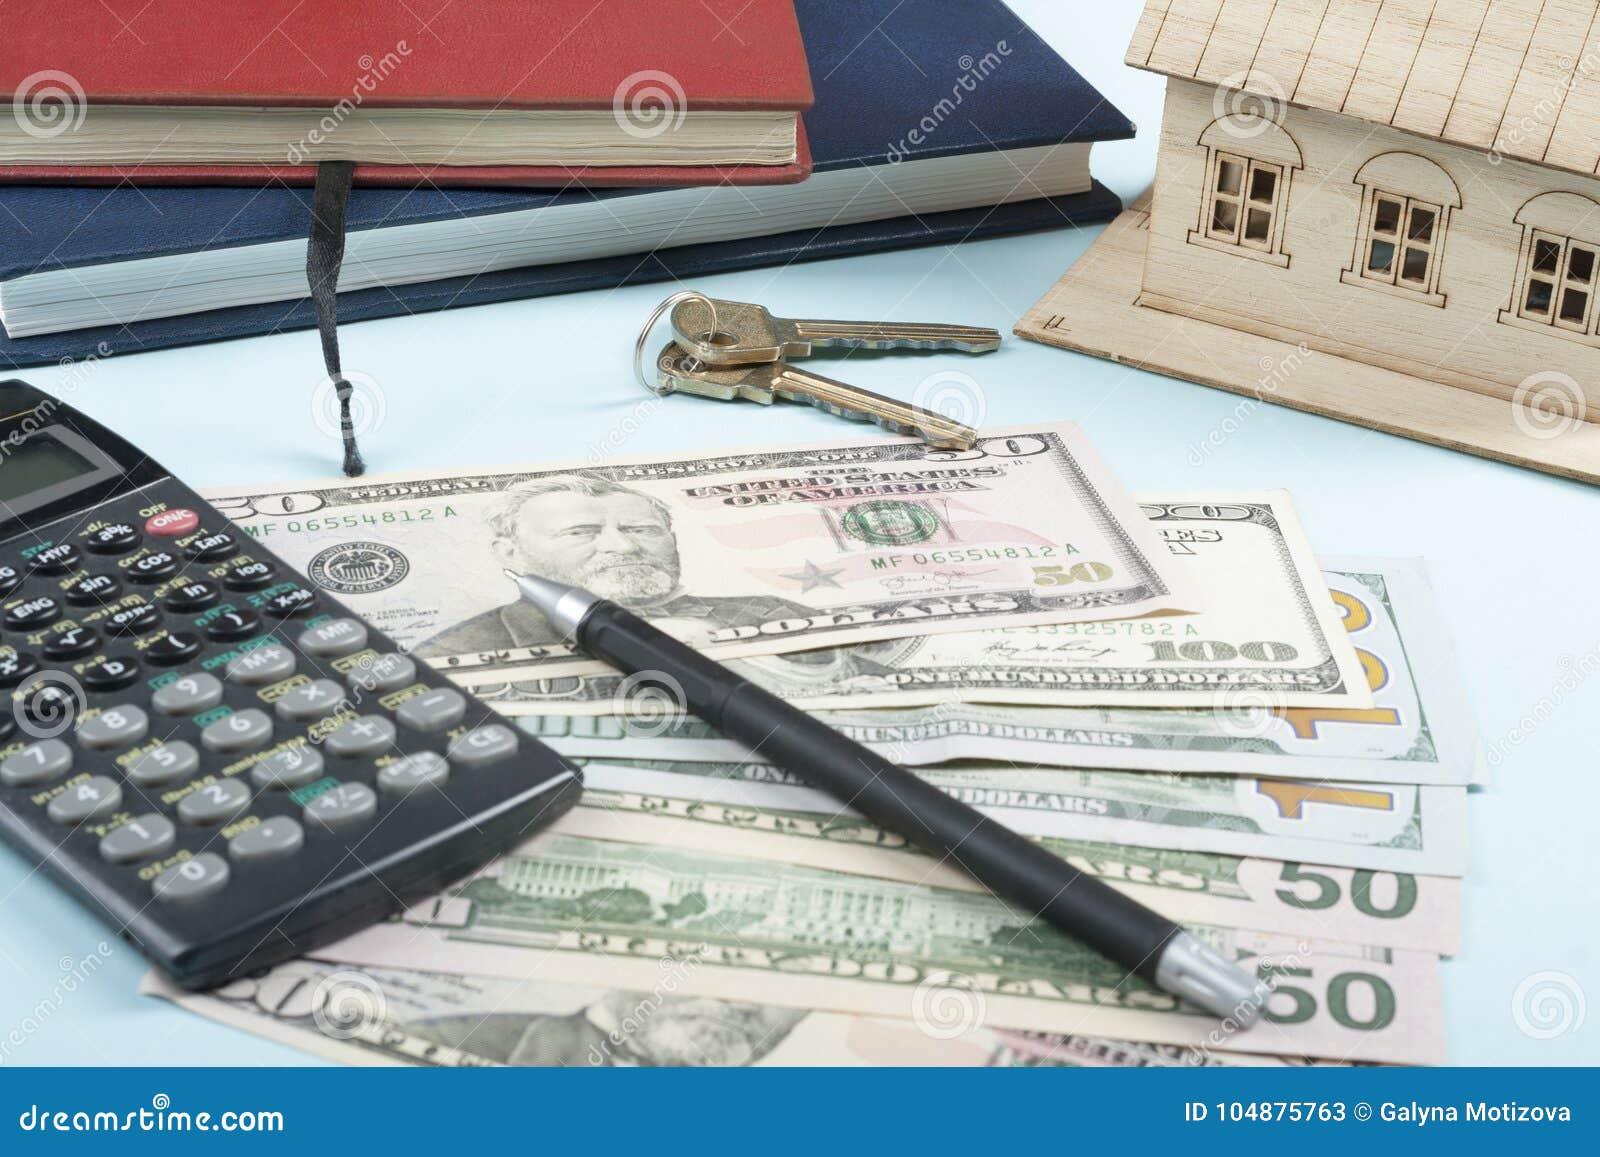 home savings budget concept model house notepad pen calculator